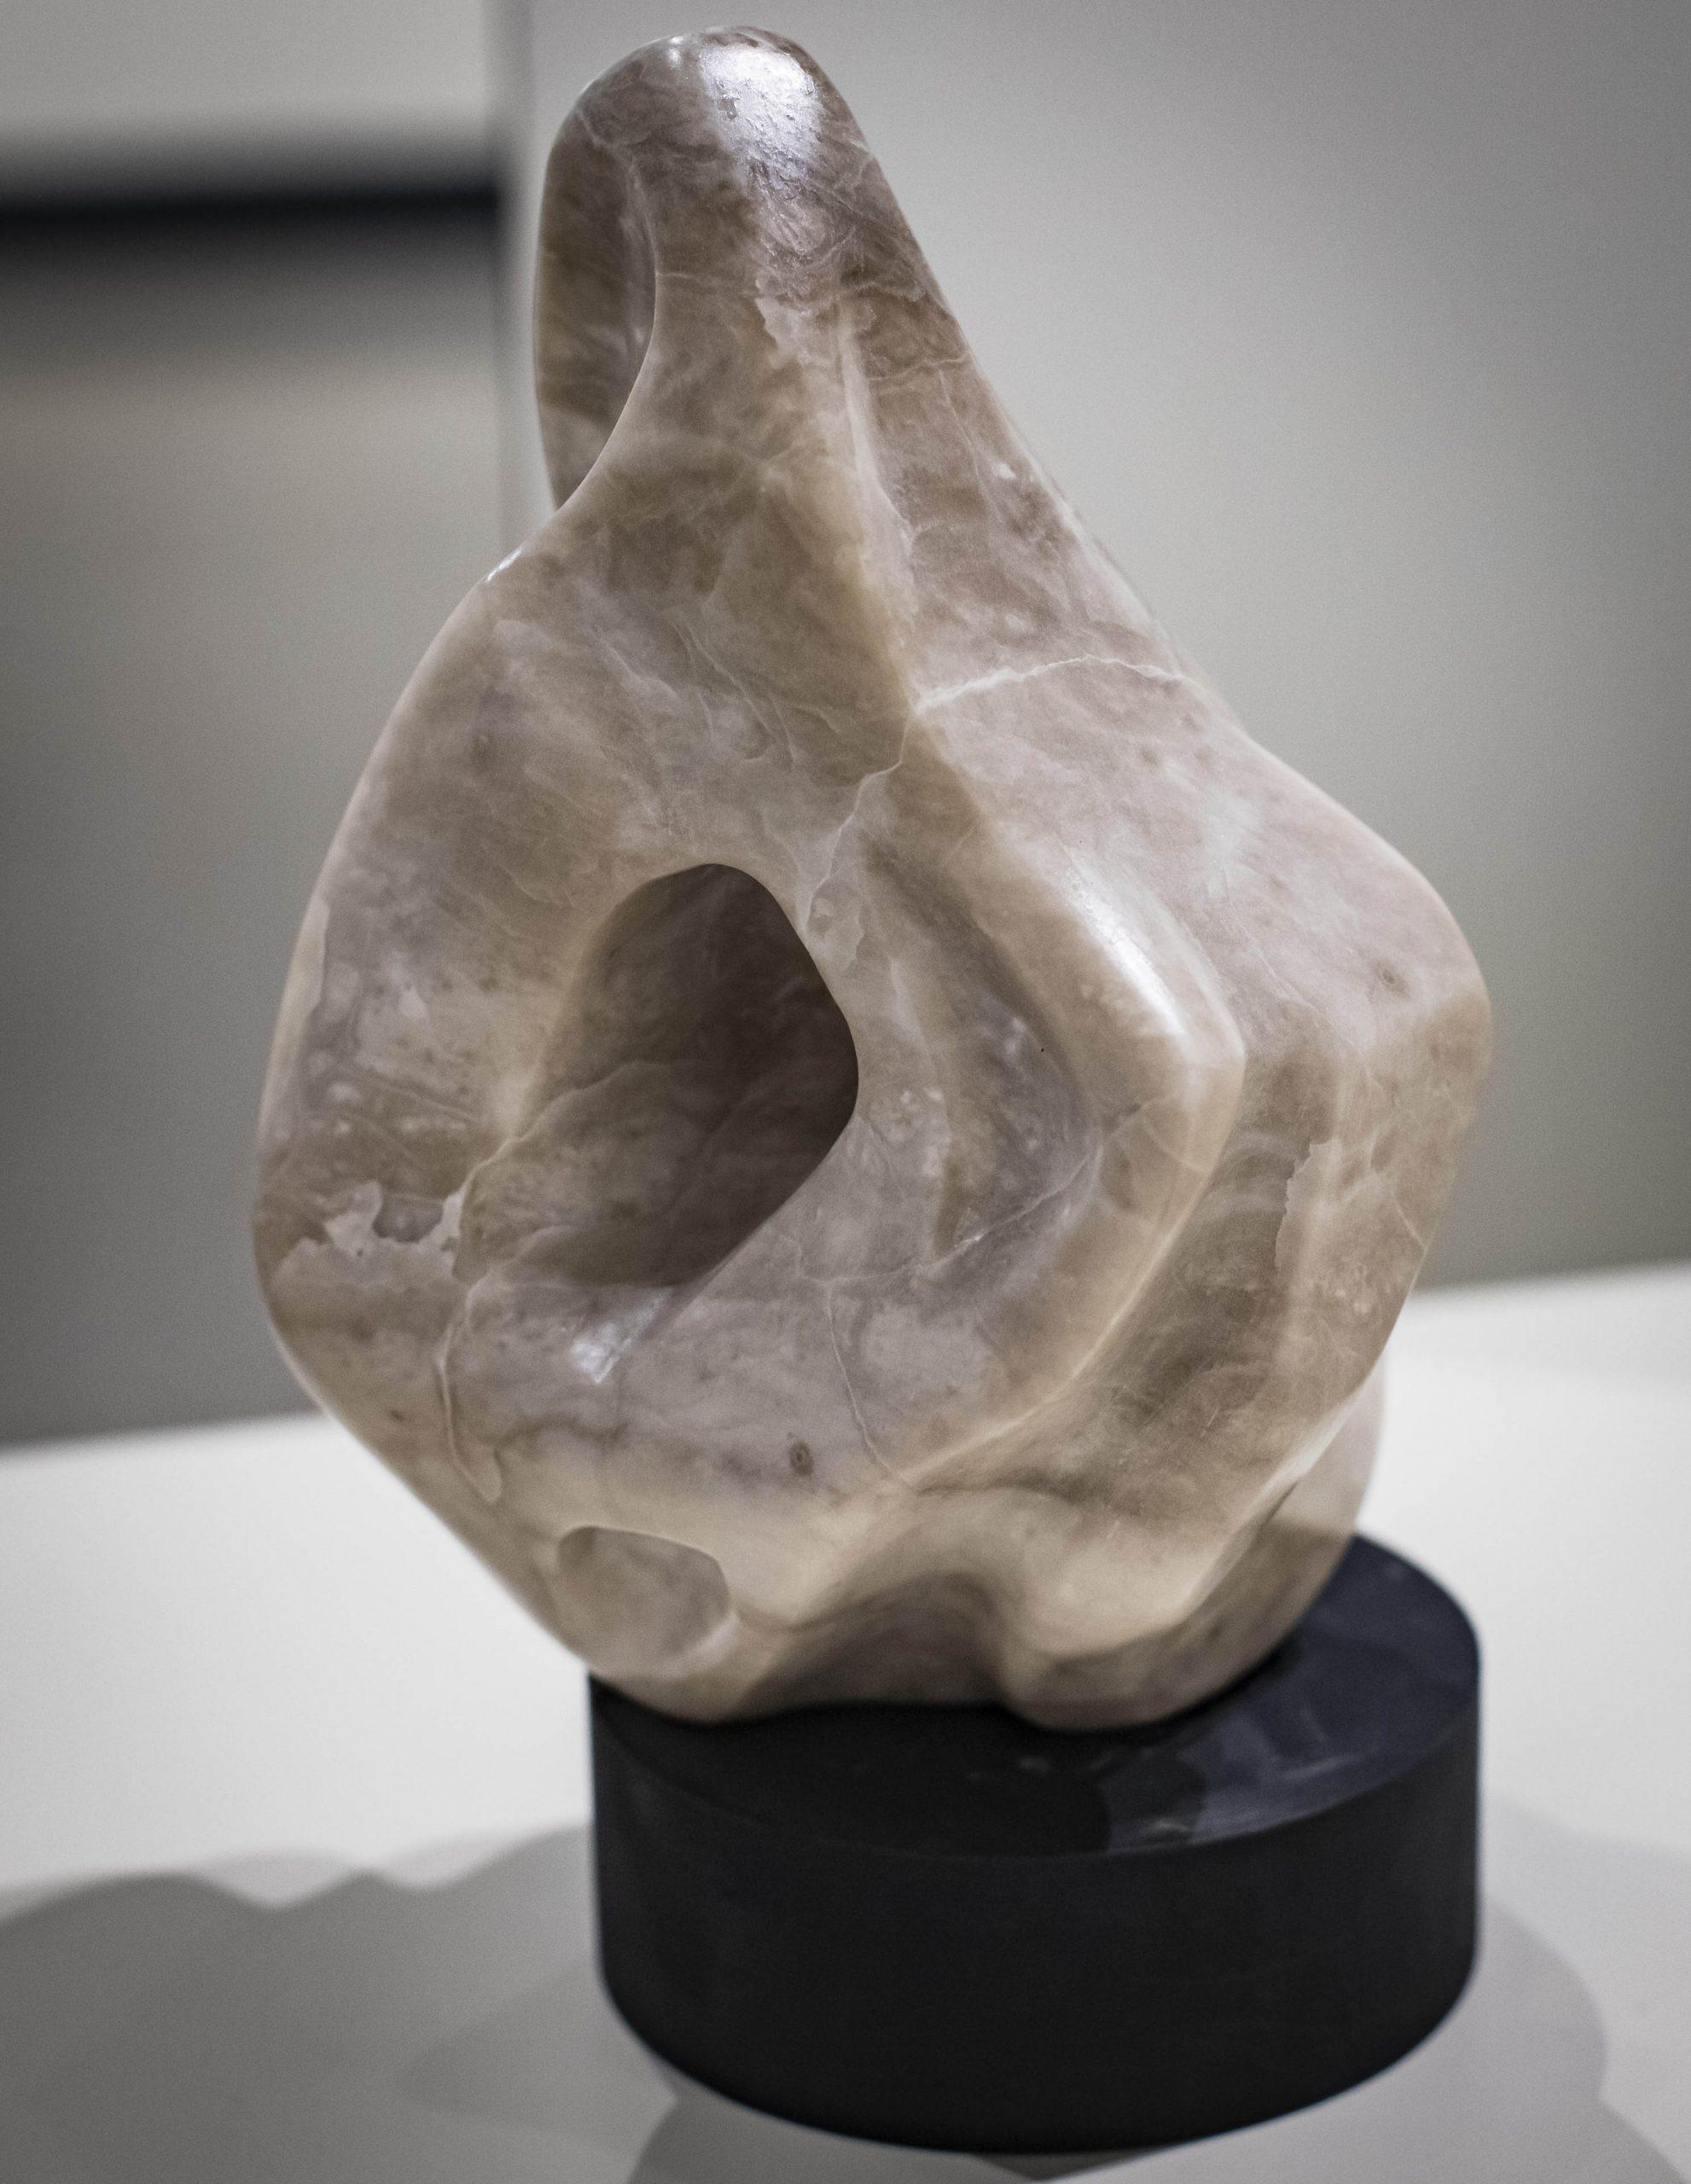 Lisa Taylor of Valdosta, Georgia Cyclops (Stone)